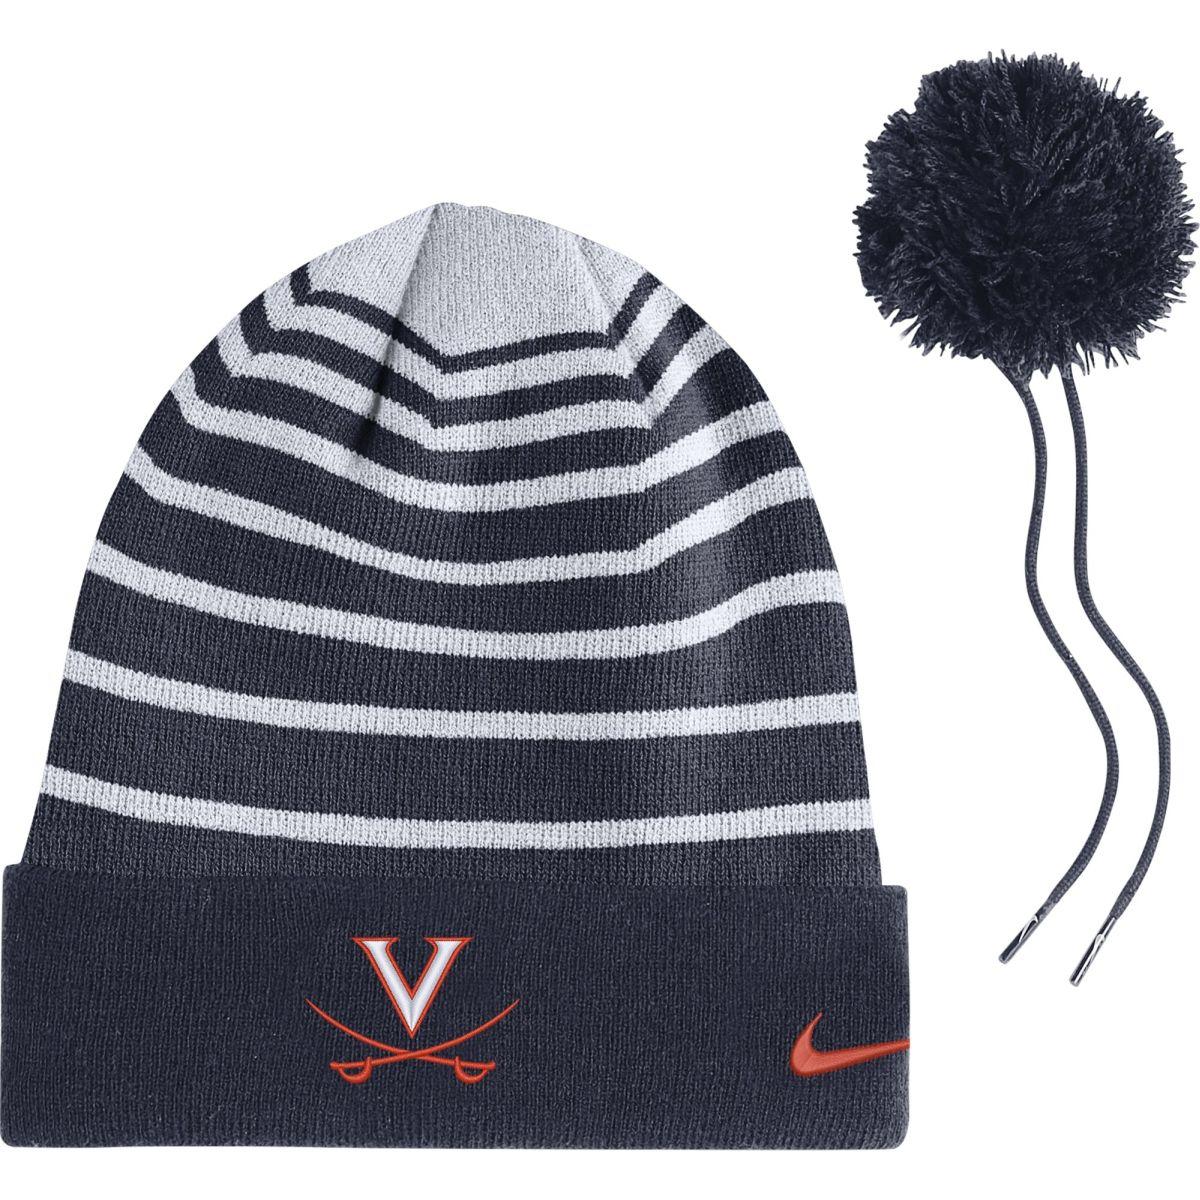 University of Virginia Striped Detachable Pom Beanie